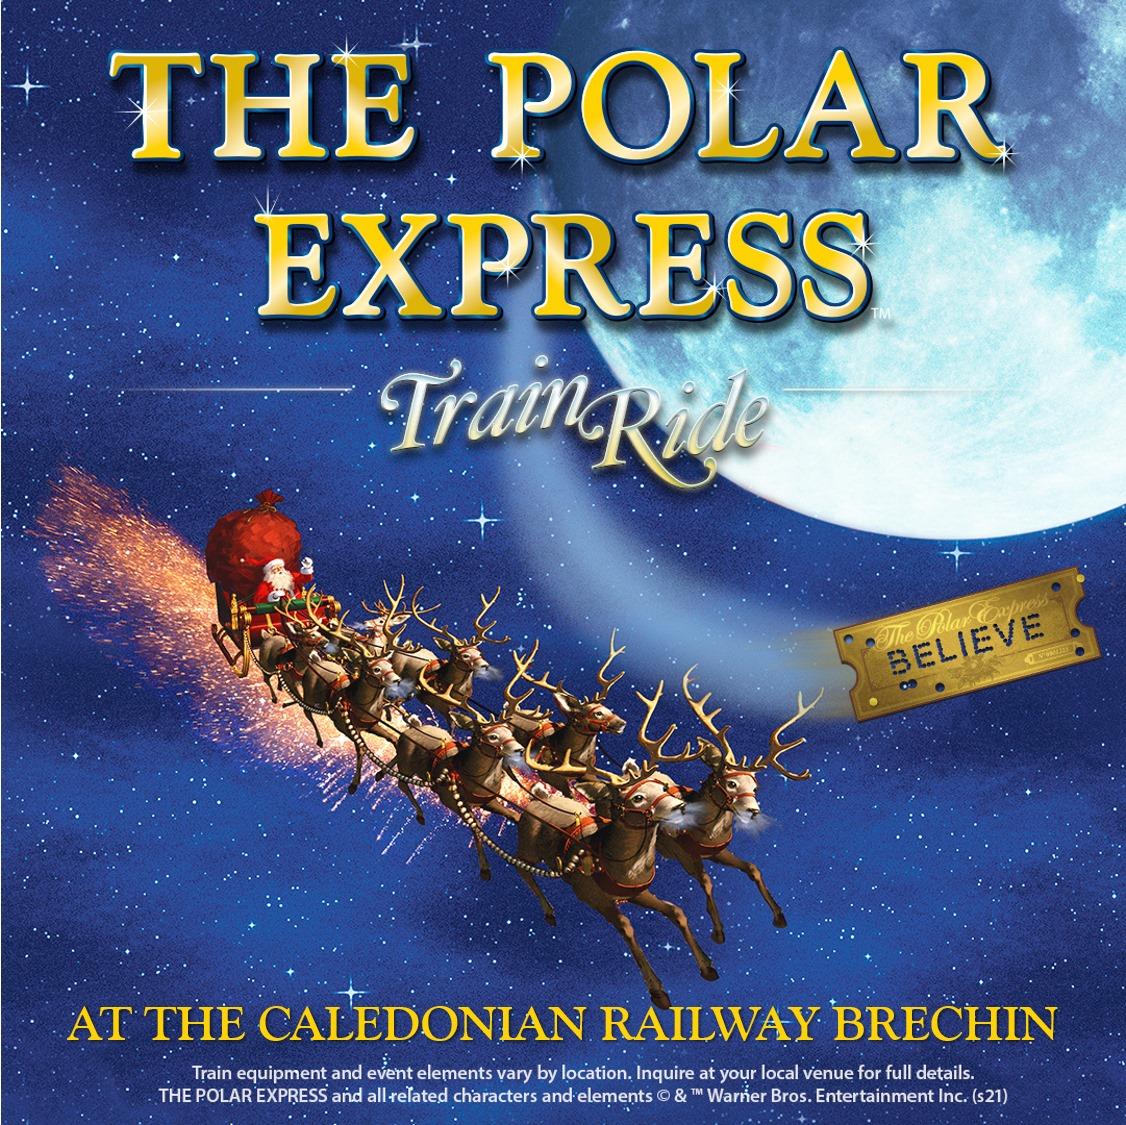 Polar Express Train Ride 2021 at the Caledonian Railway.